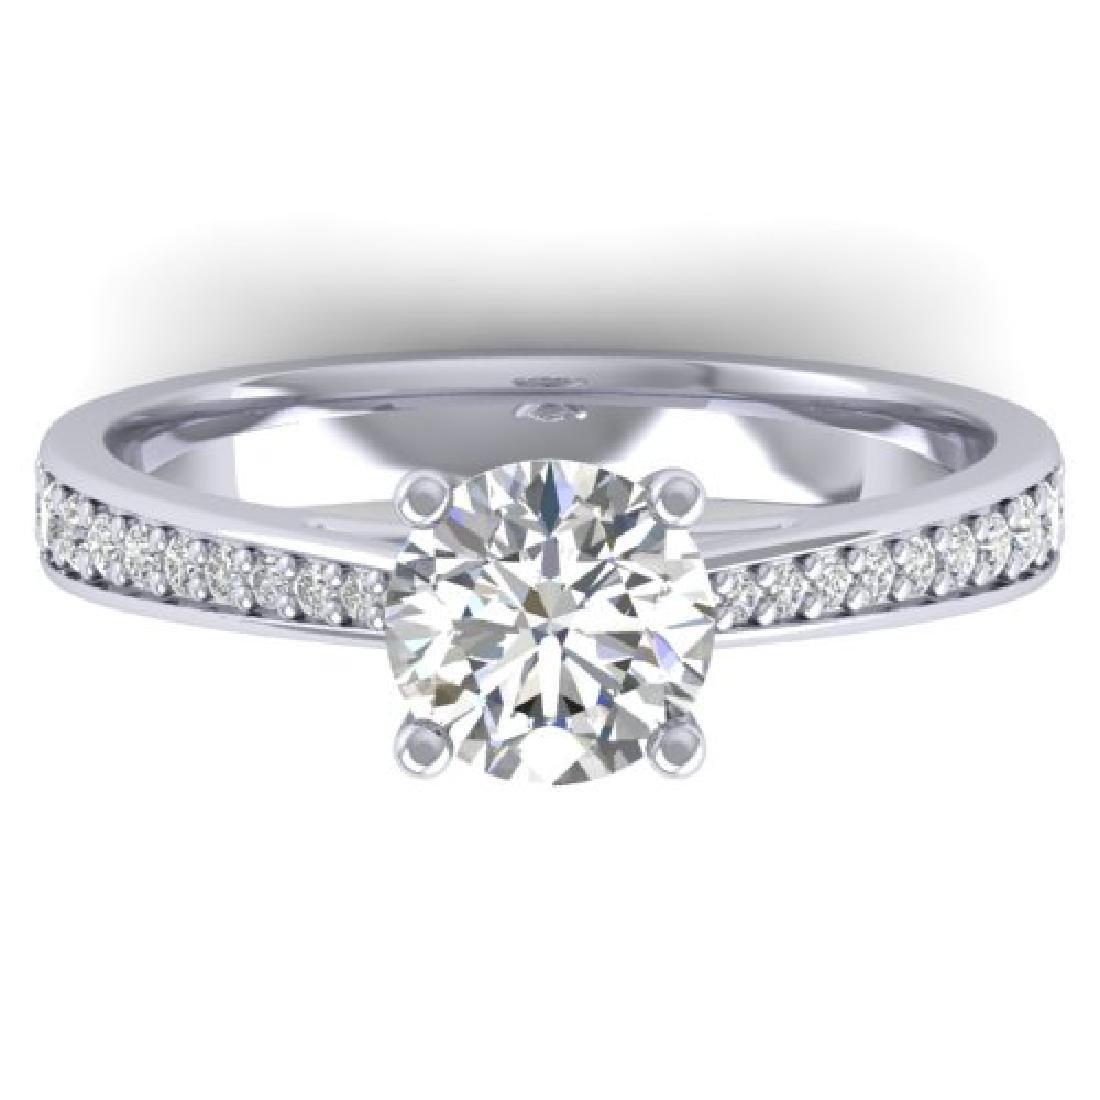 1.26 CTW Certified VS/SI Diamond Solitaire Art Deco